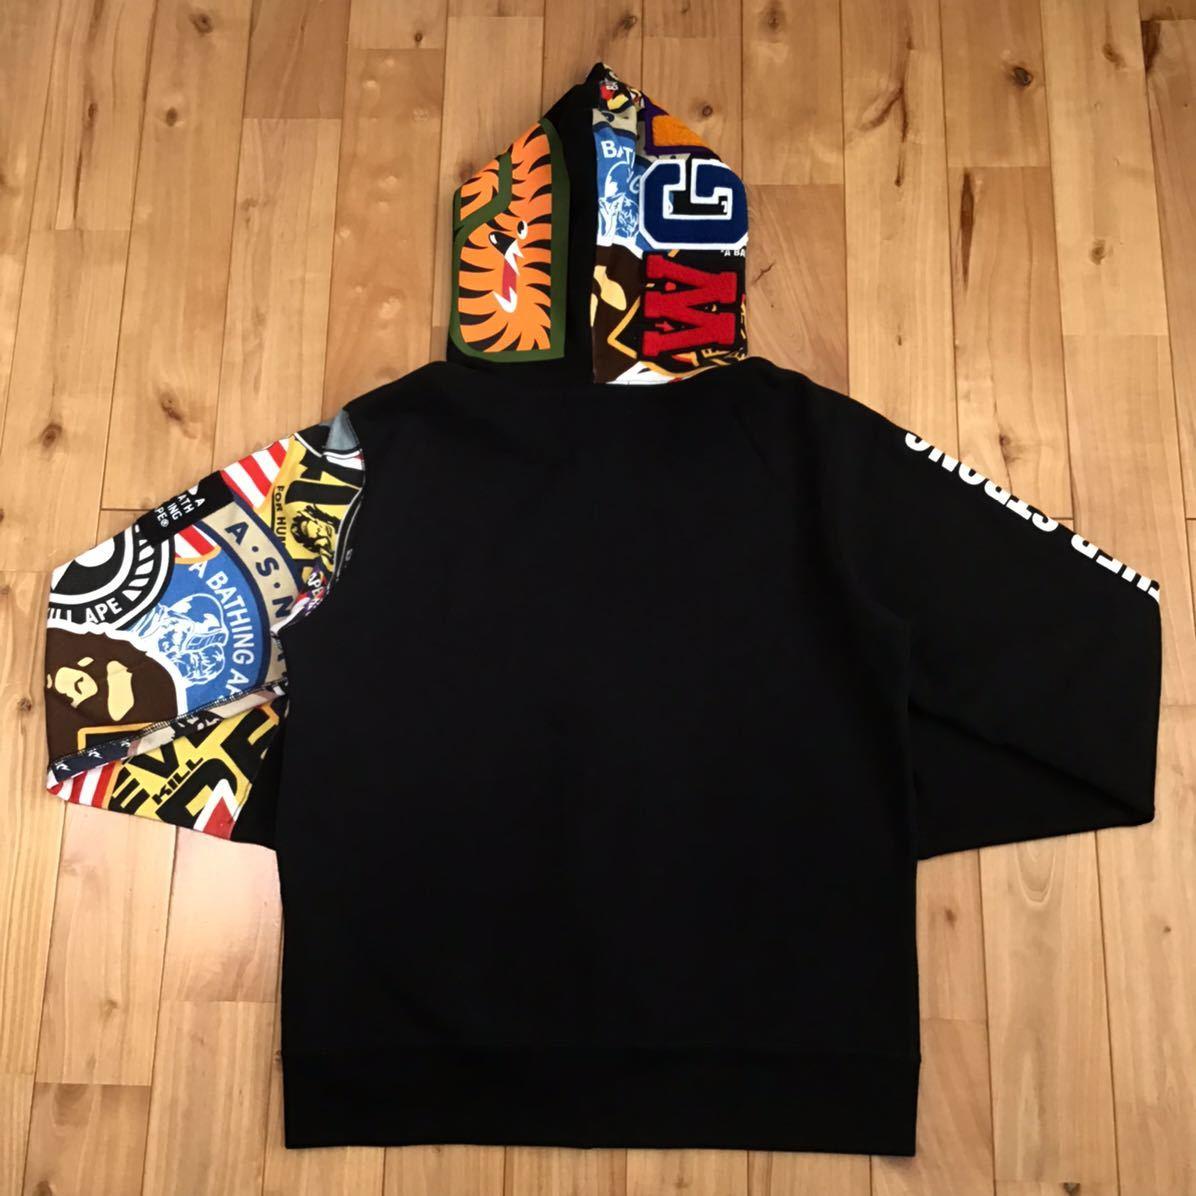 Patched シャーク パーカー Mサイズ shark full zip hoodie a bathing ape bape エイプ ベイプ アベイシングエイプ 9mo